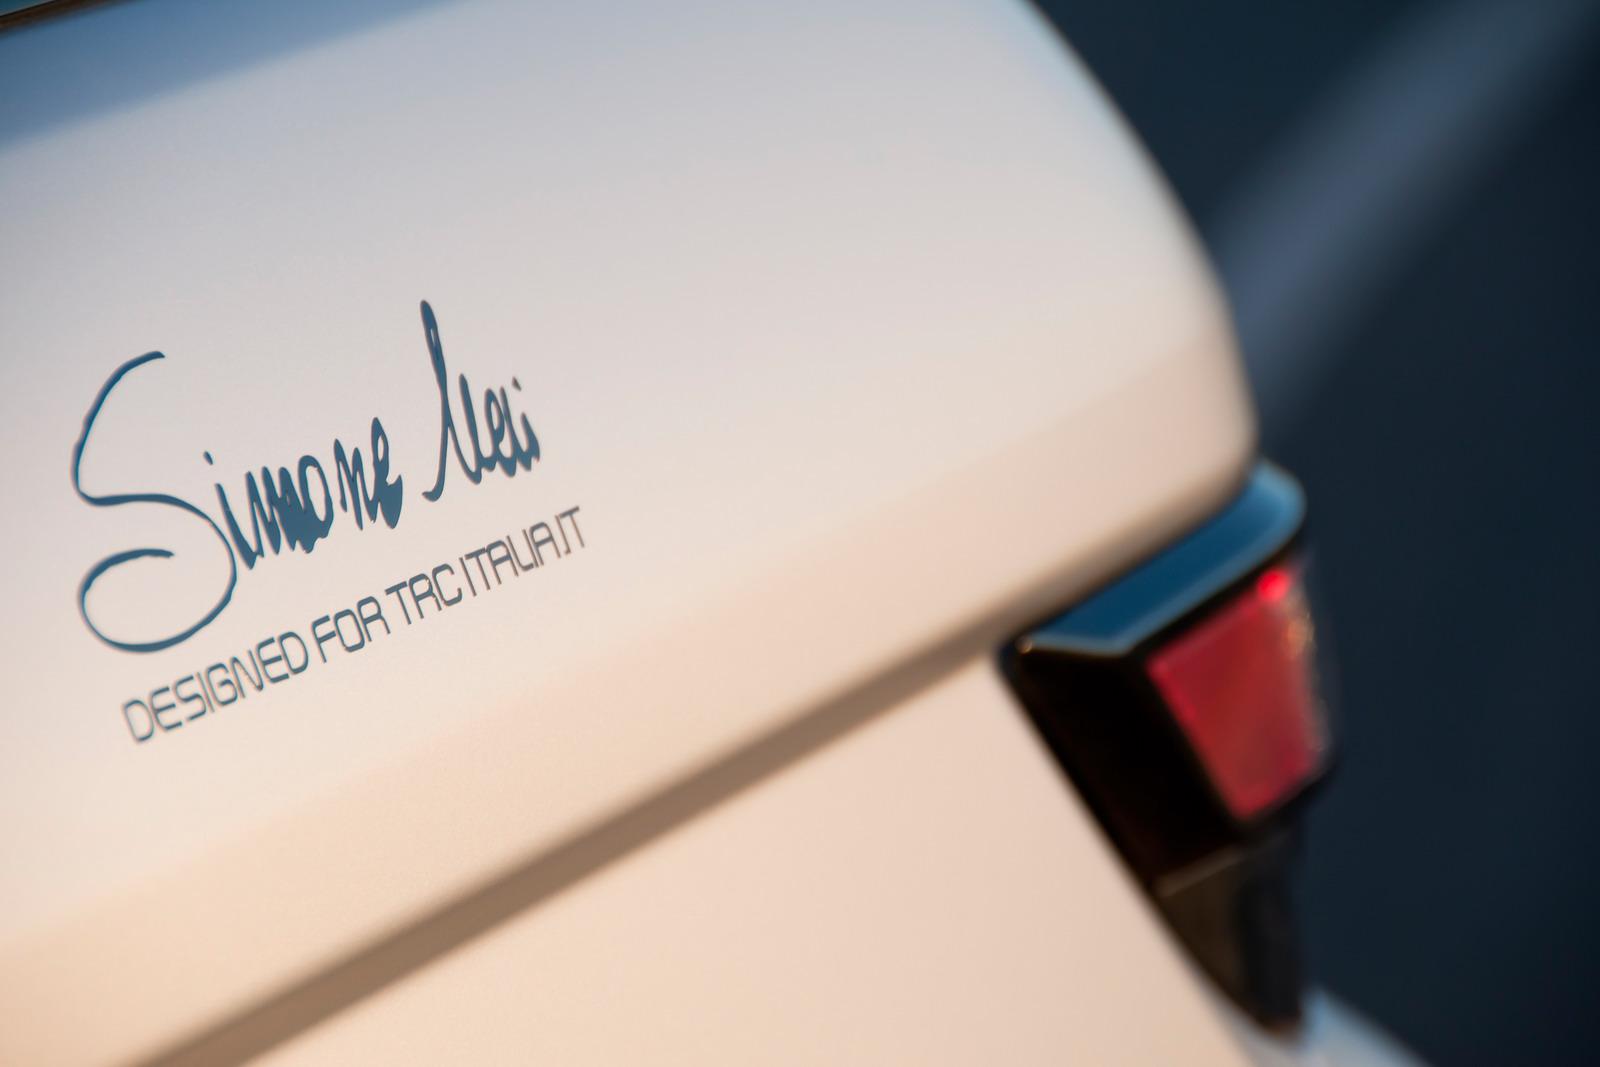 Marangoni Range Rover Evoque Hfi R Foto 9 Di 13